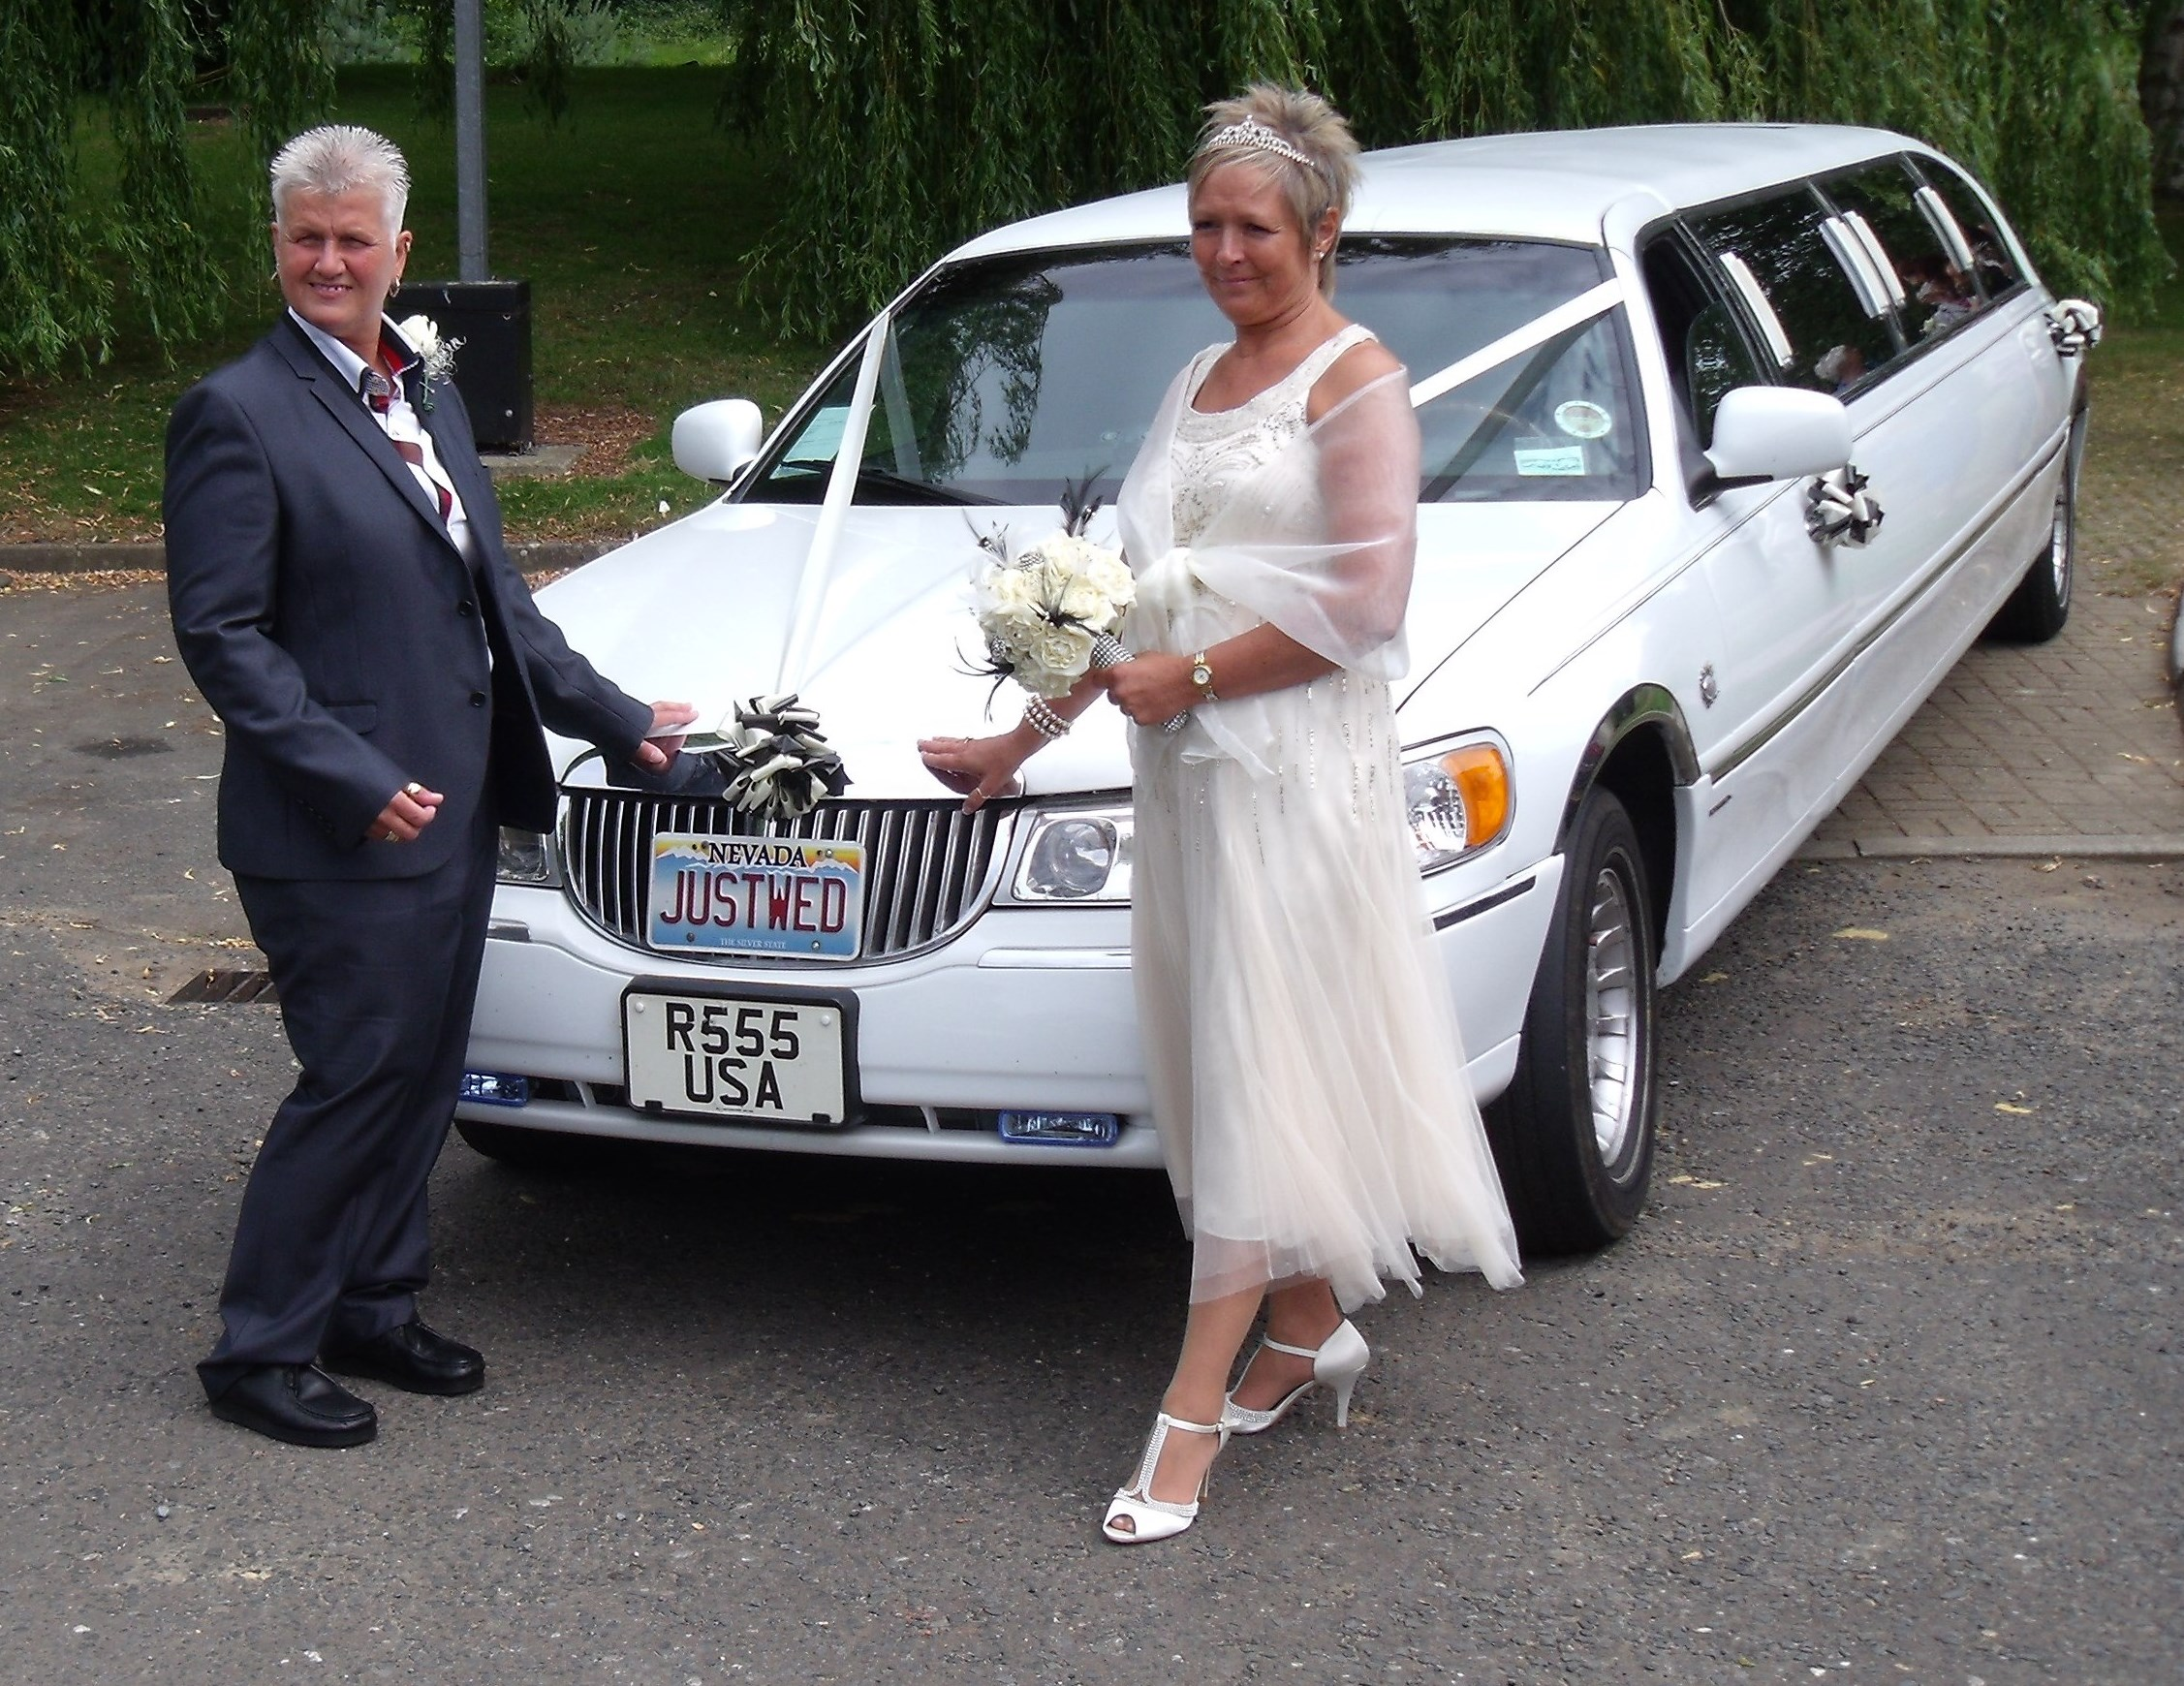 cwedding photo's 001.JPG